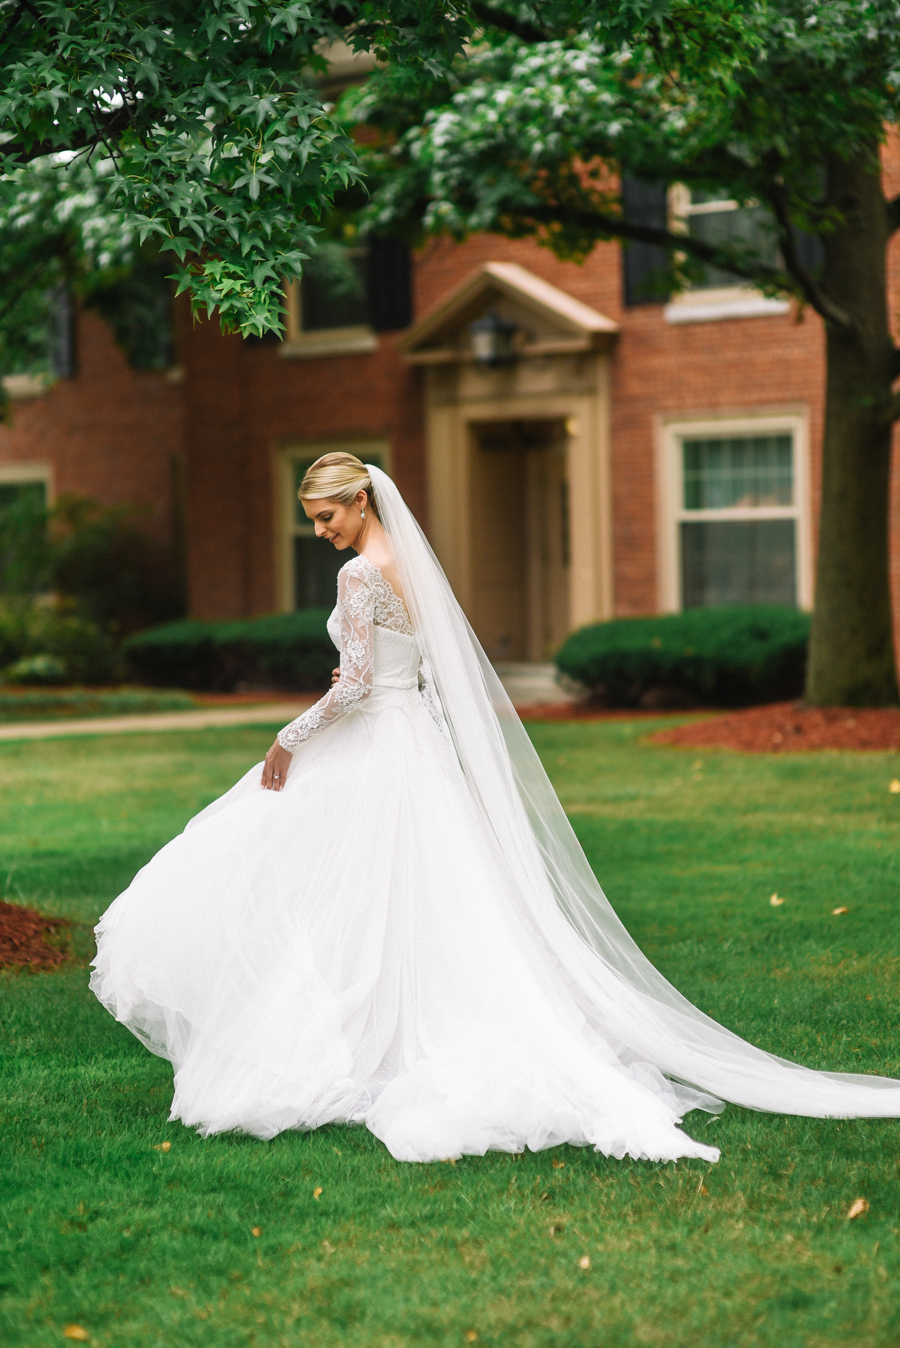 Henry_Ford__Lovett_Hall_Wedding_Detroit-3.jpg